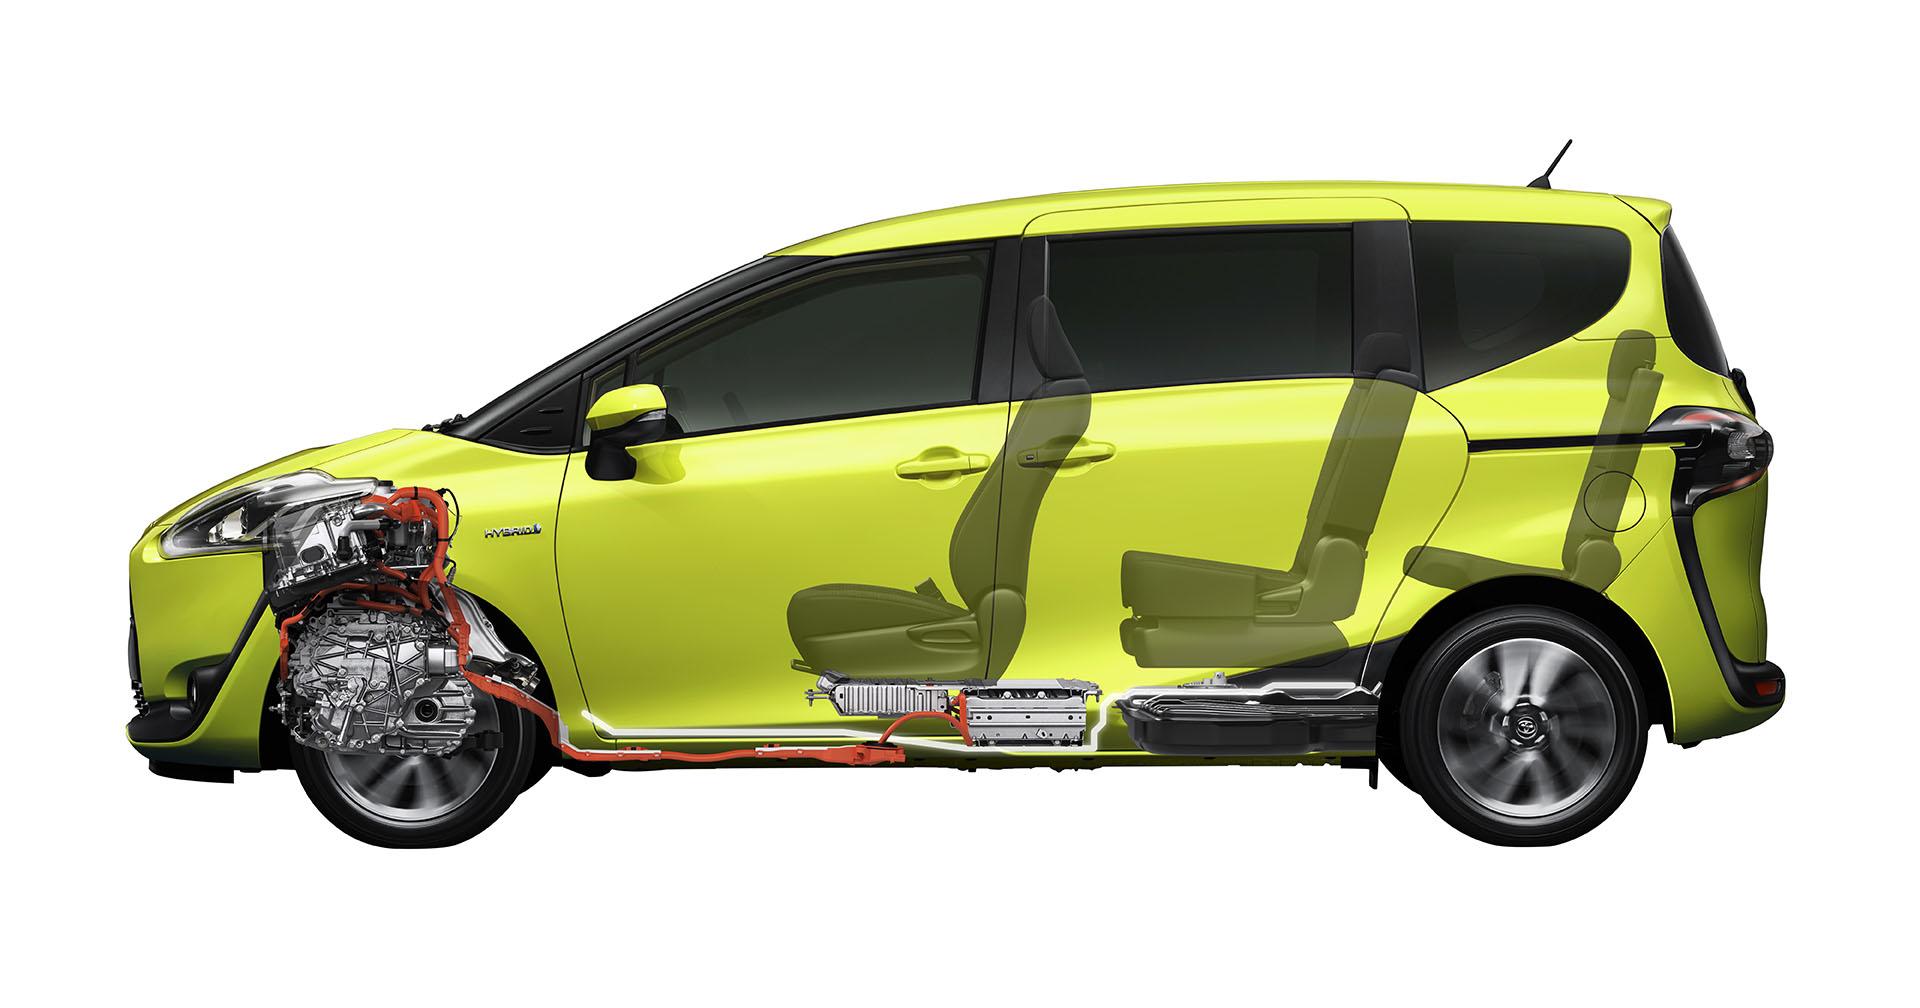 2016 Toyota Sienta hybrid powetrain unveiled in Japan